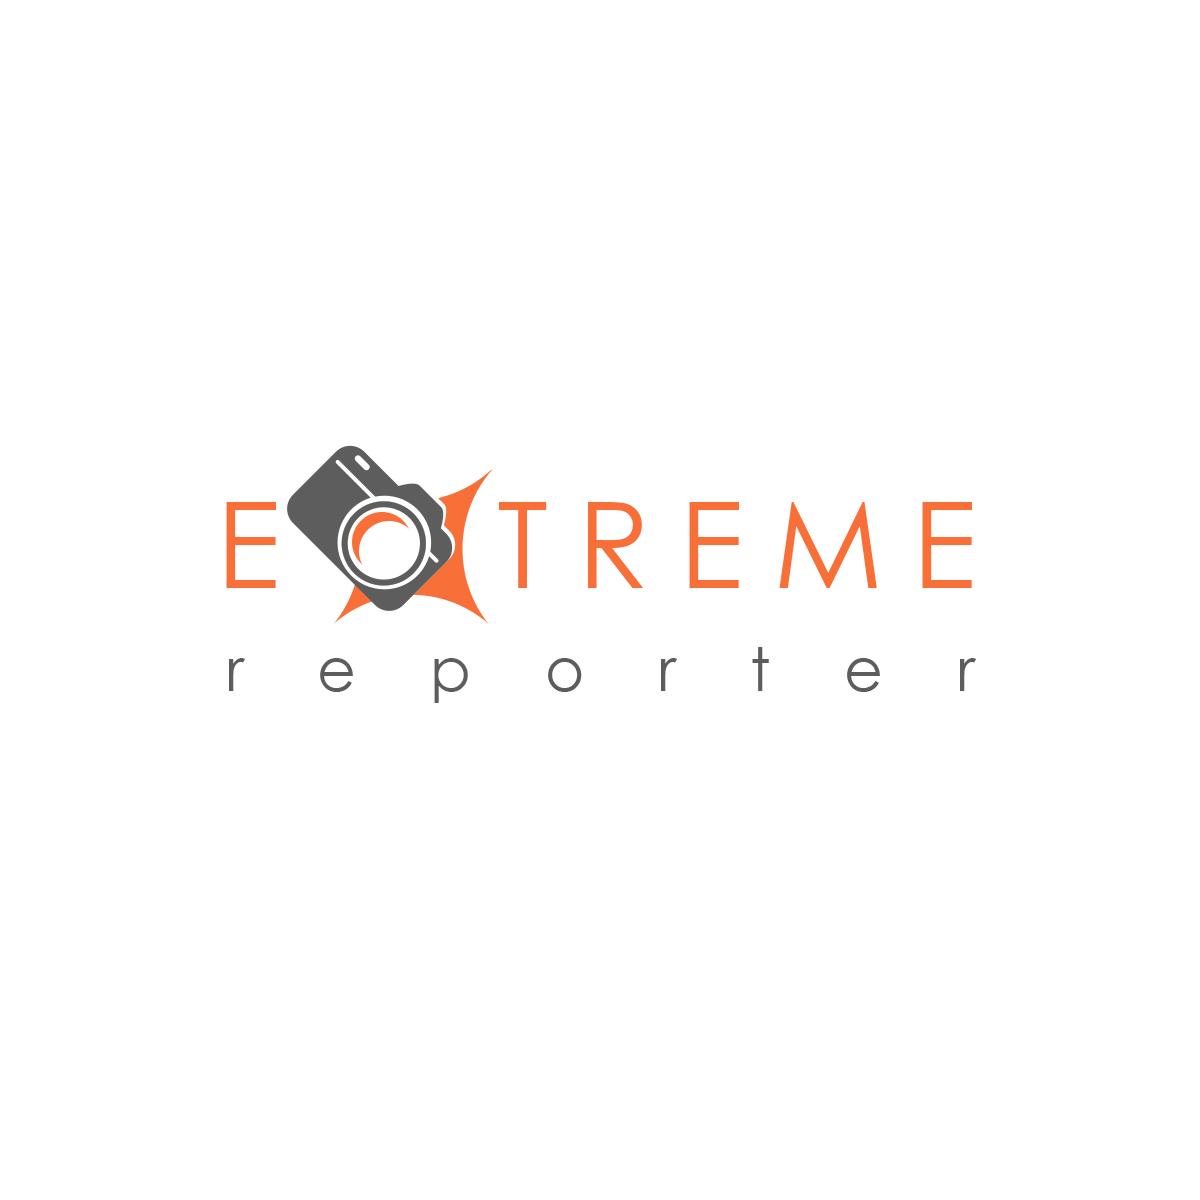 Логотип для экстрим фотографа.  фото f_8295a5507bb98902.jpg